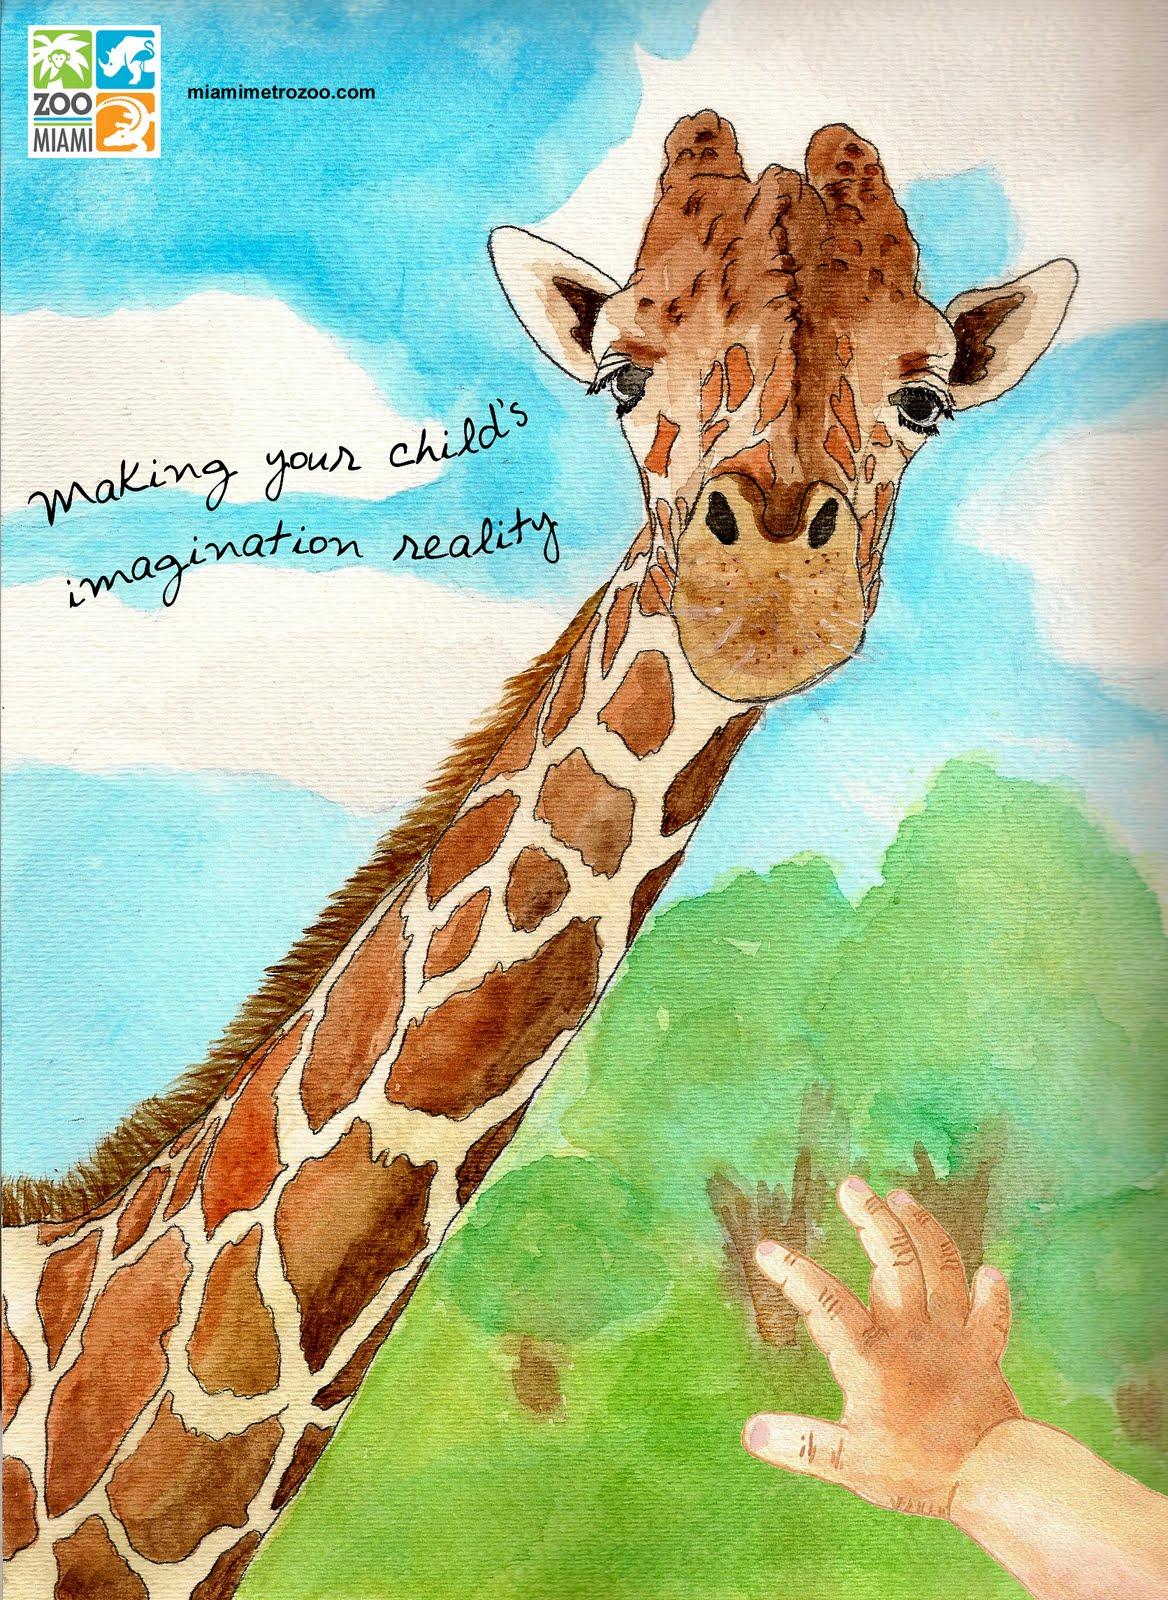 imagemaking: Zoo Miami Poster